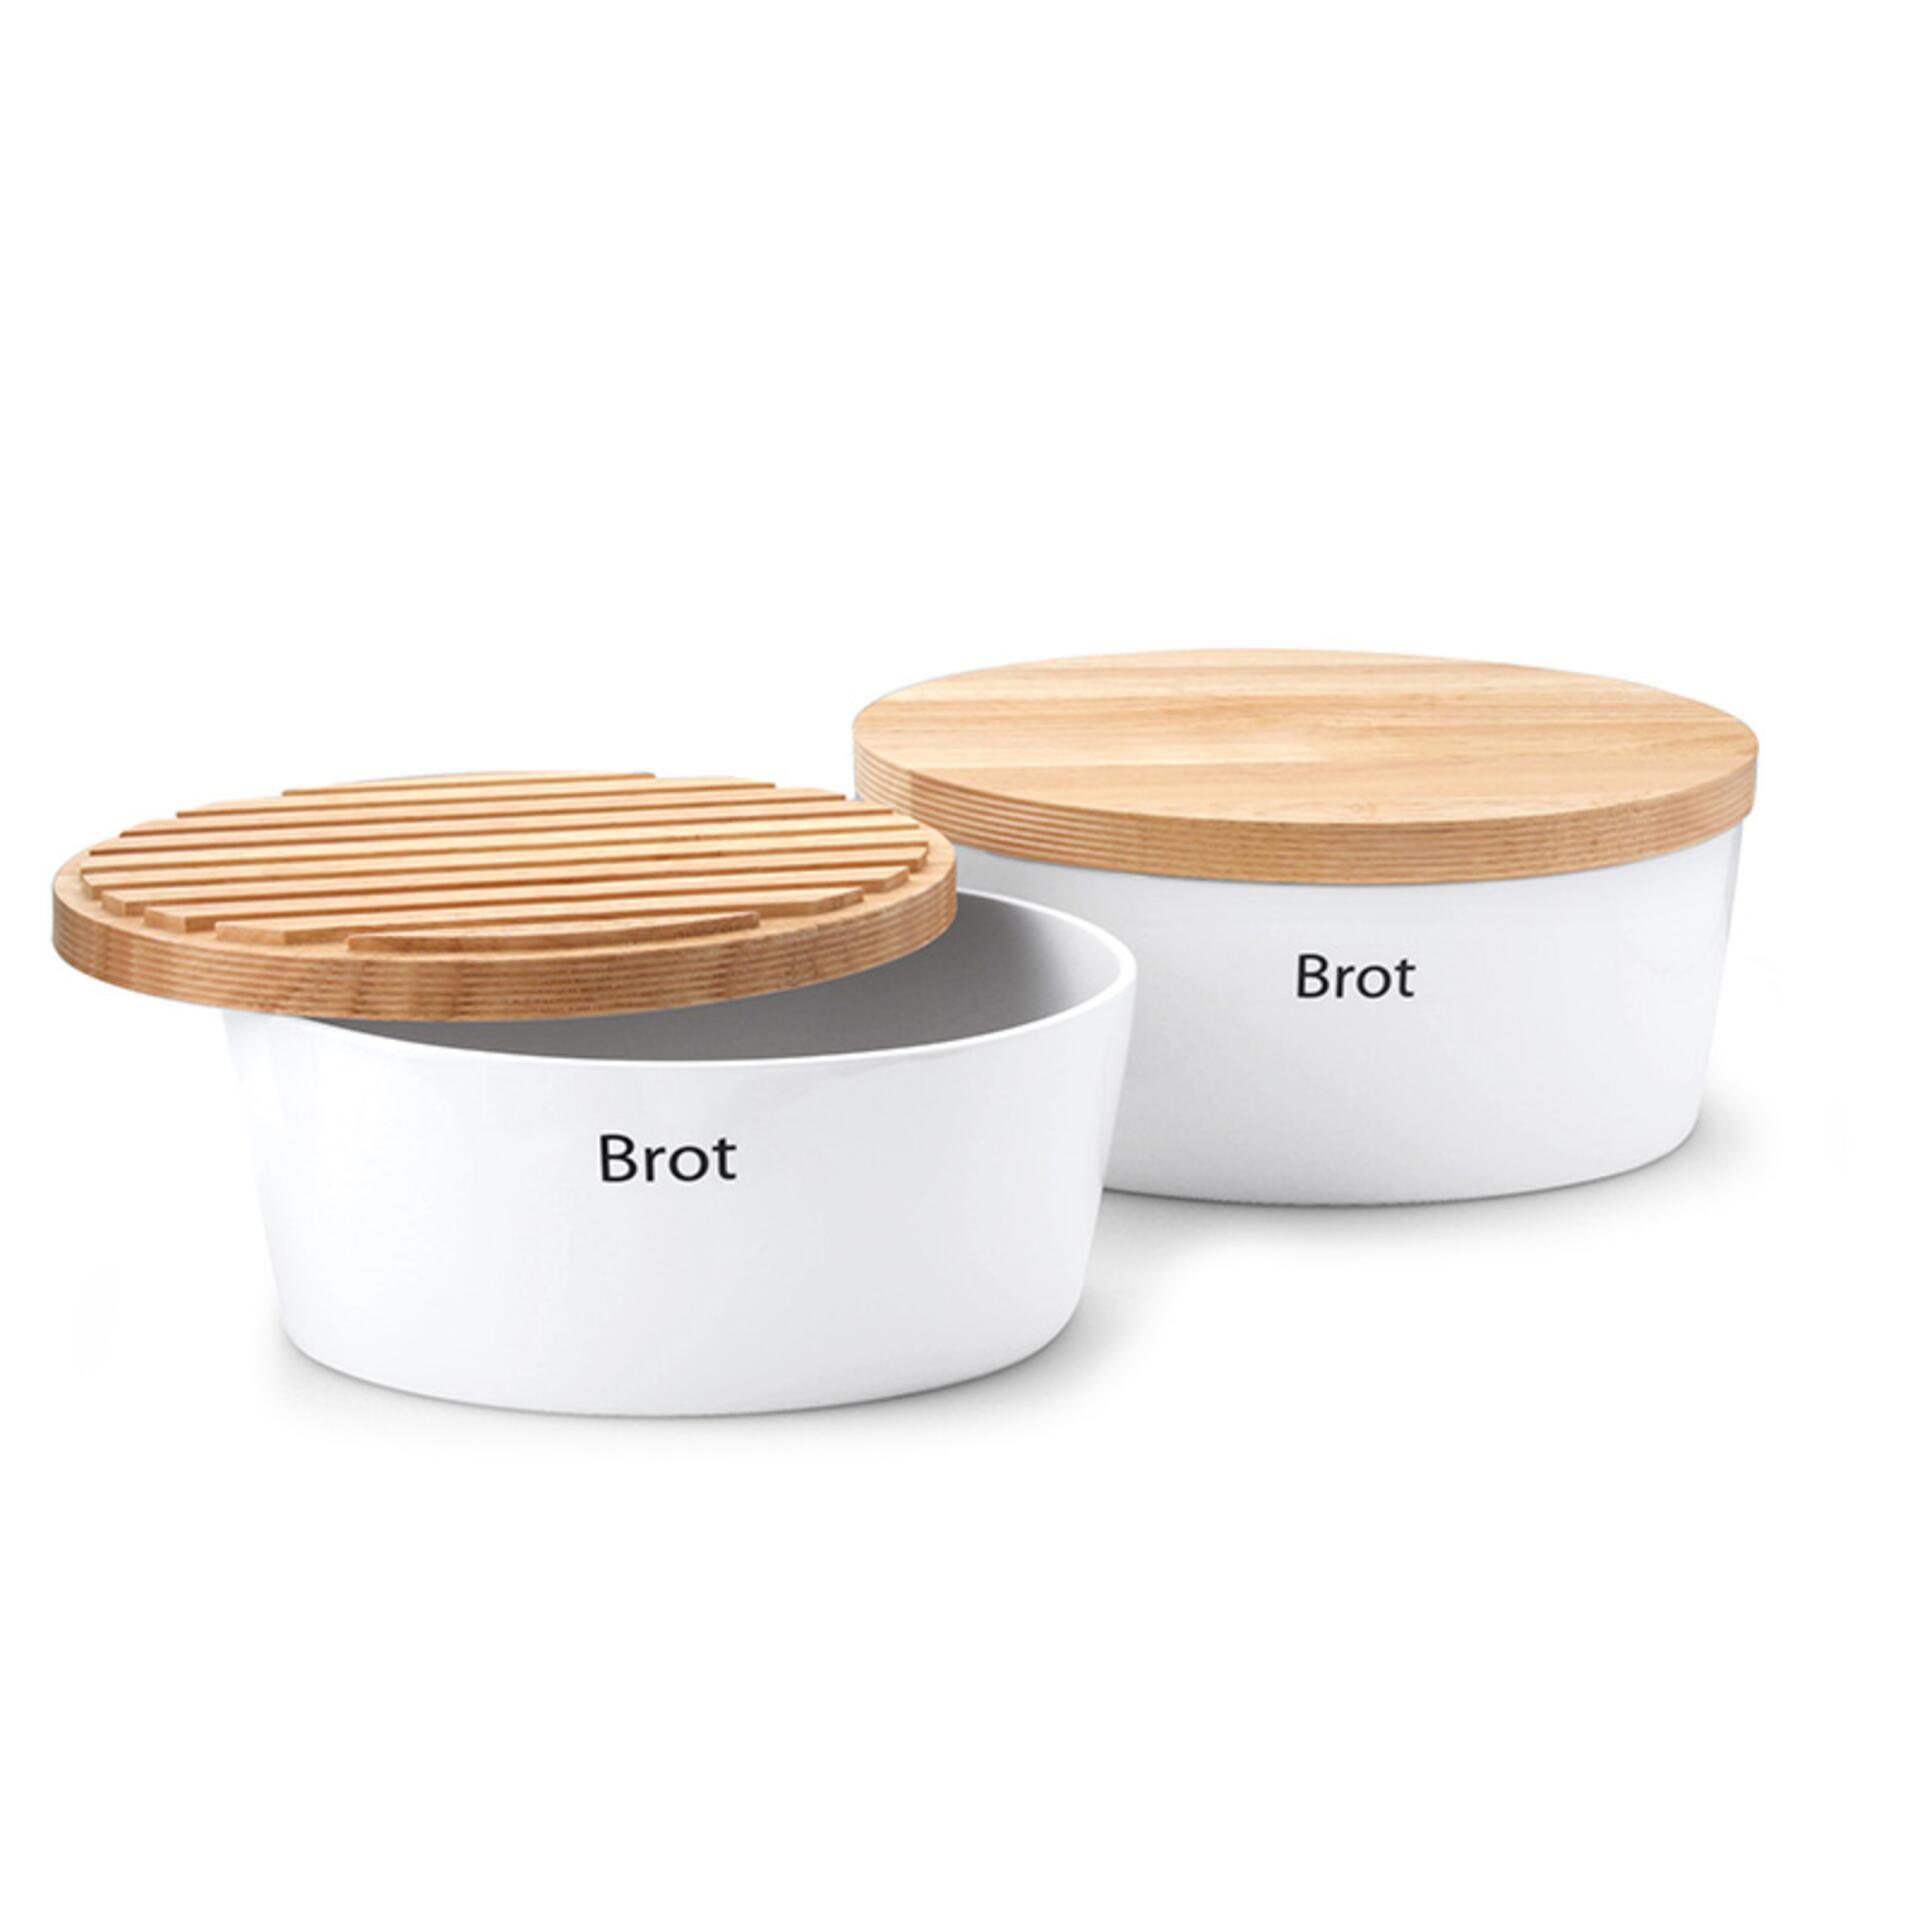 Continenta Brottopf oval mit Holzdeckel 30 x 23 x 13,5 cm